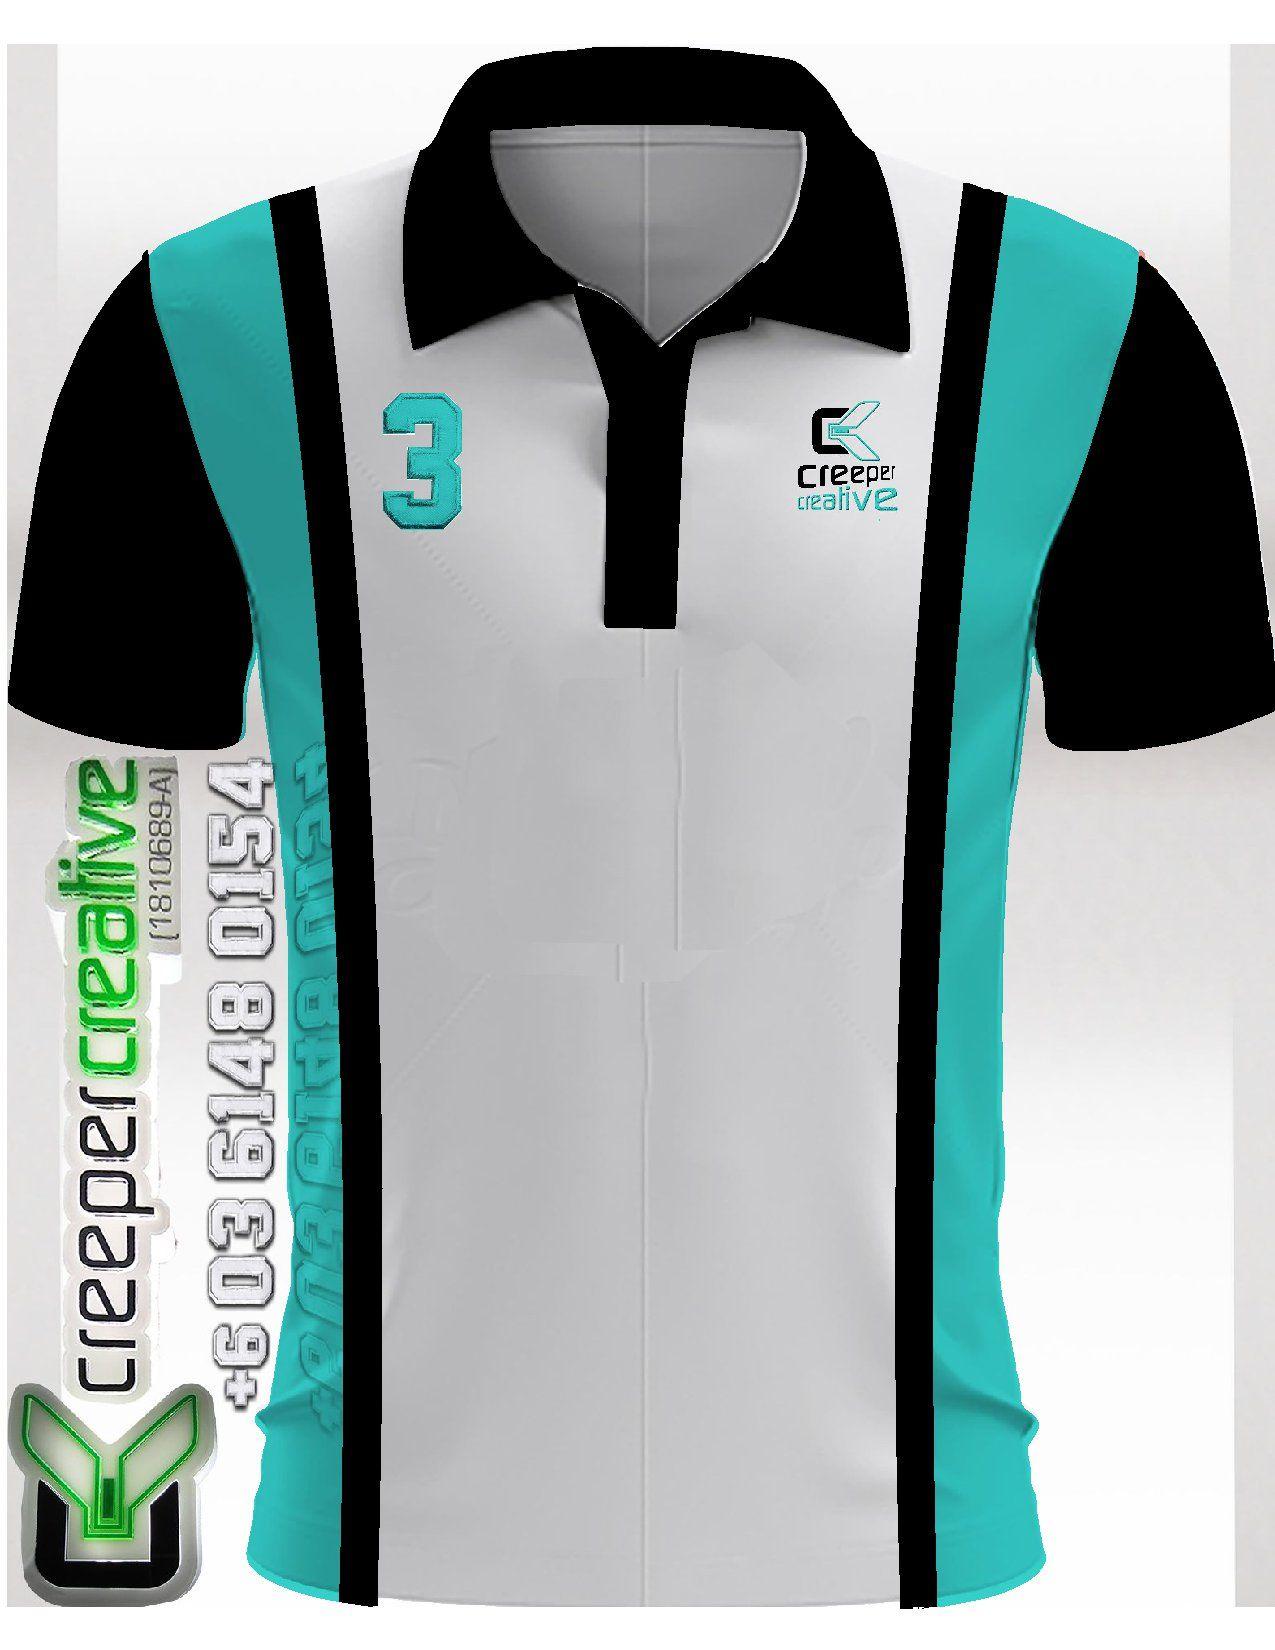 Uniform Shop Tempahan Colar T shirt Customade, Hanya dari